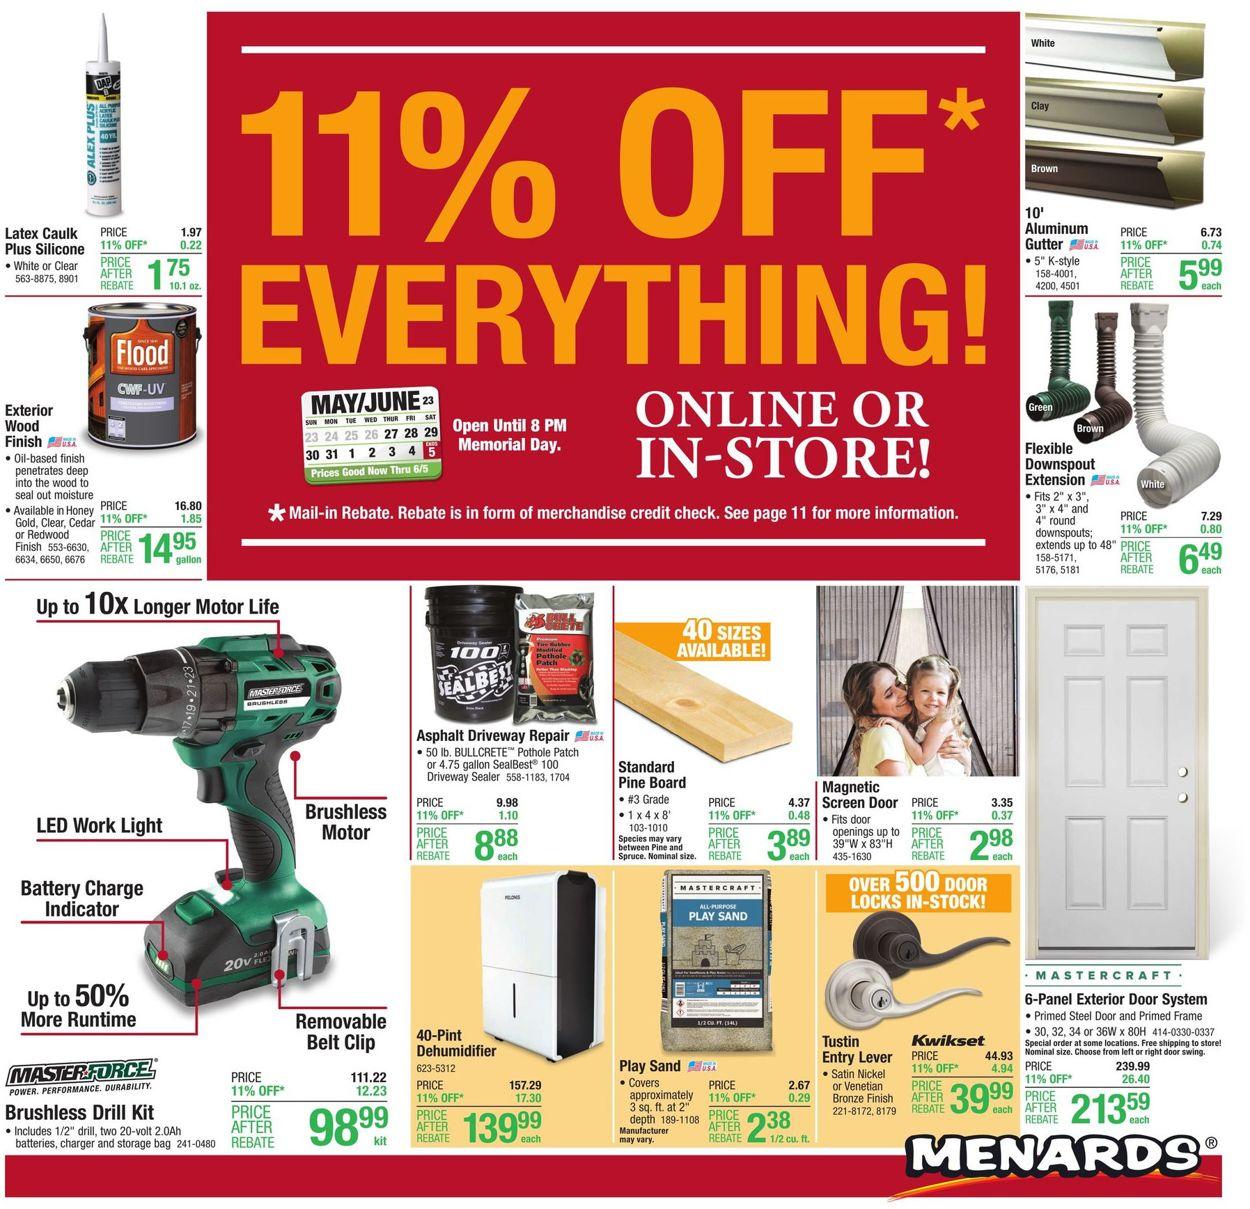 Menards Weekly Ad Circular - valid 05/27-06/05/2021